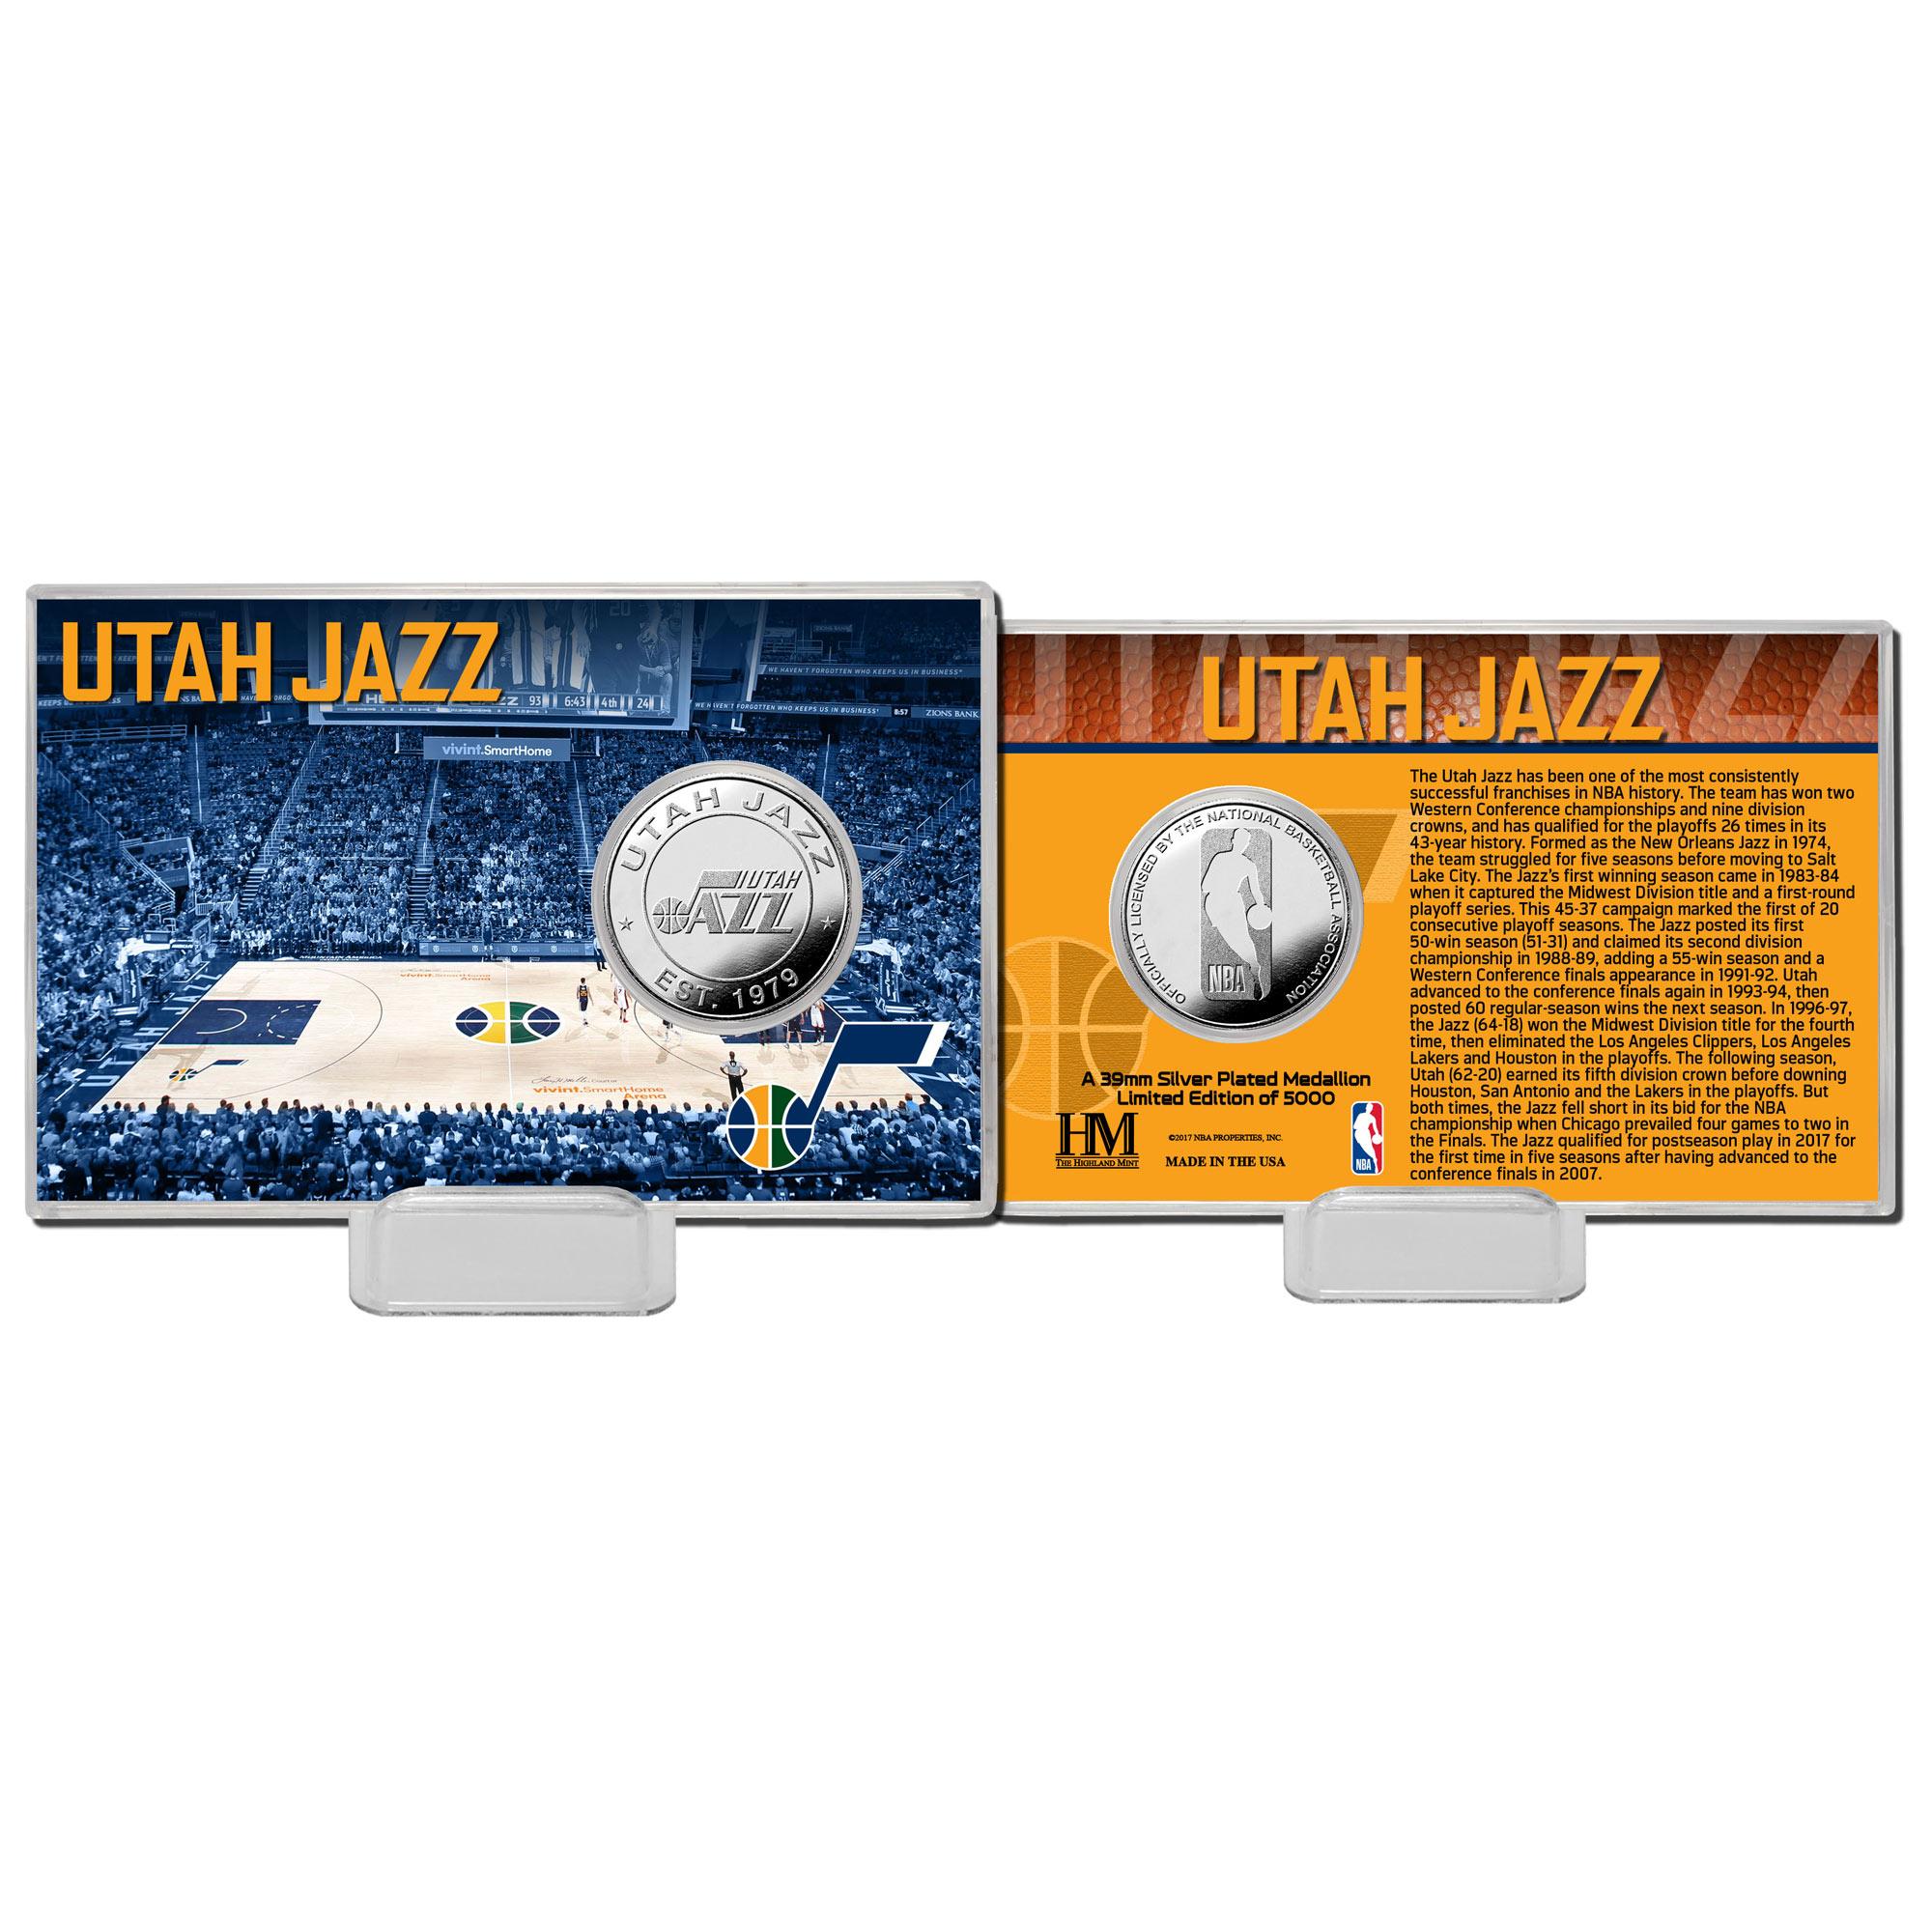 Utah Jazz Highland Mint History Coin Card